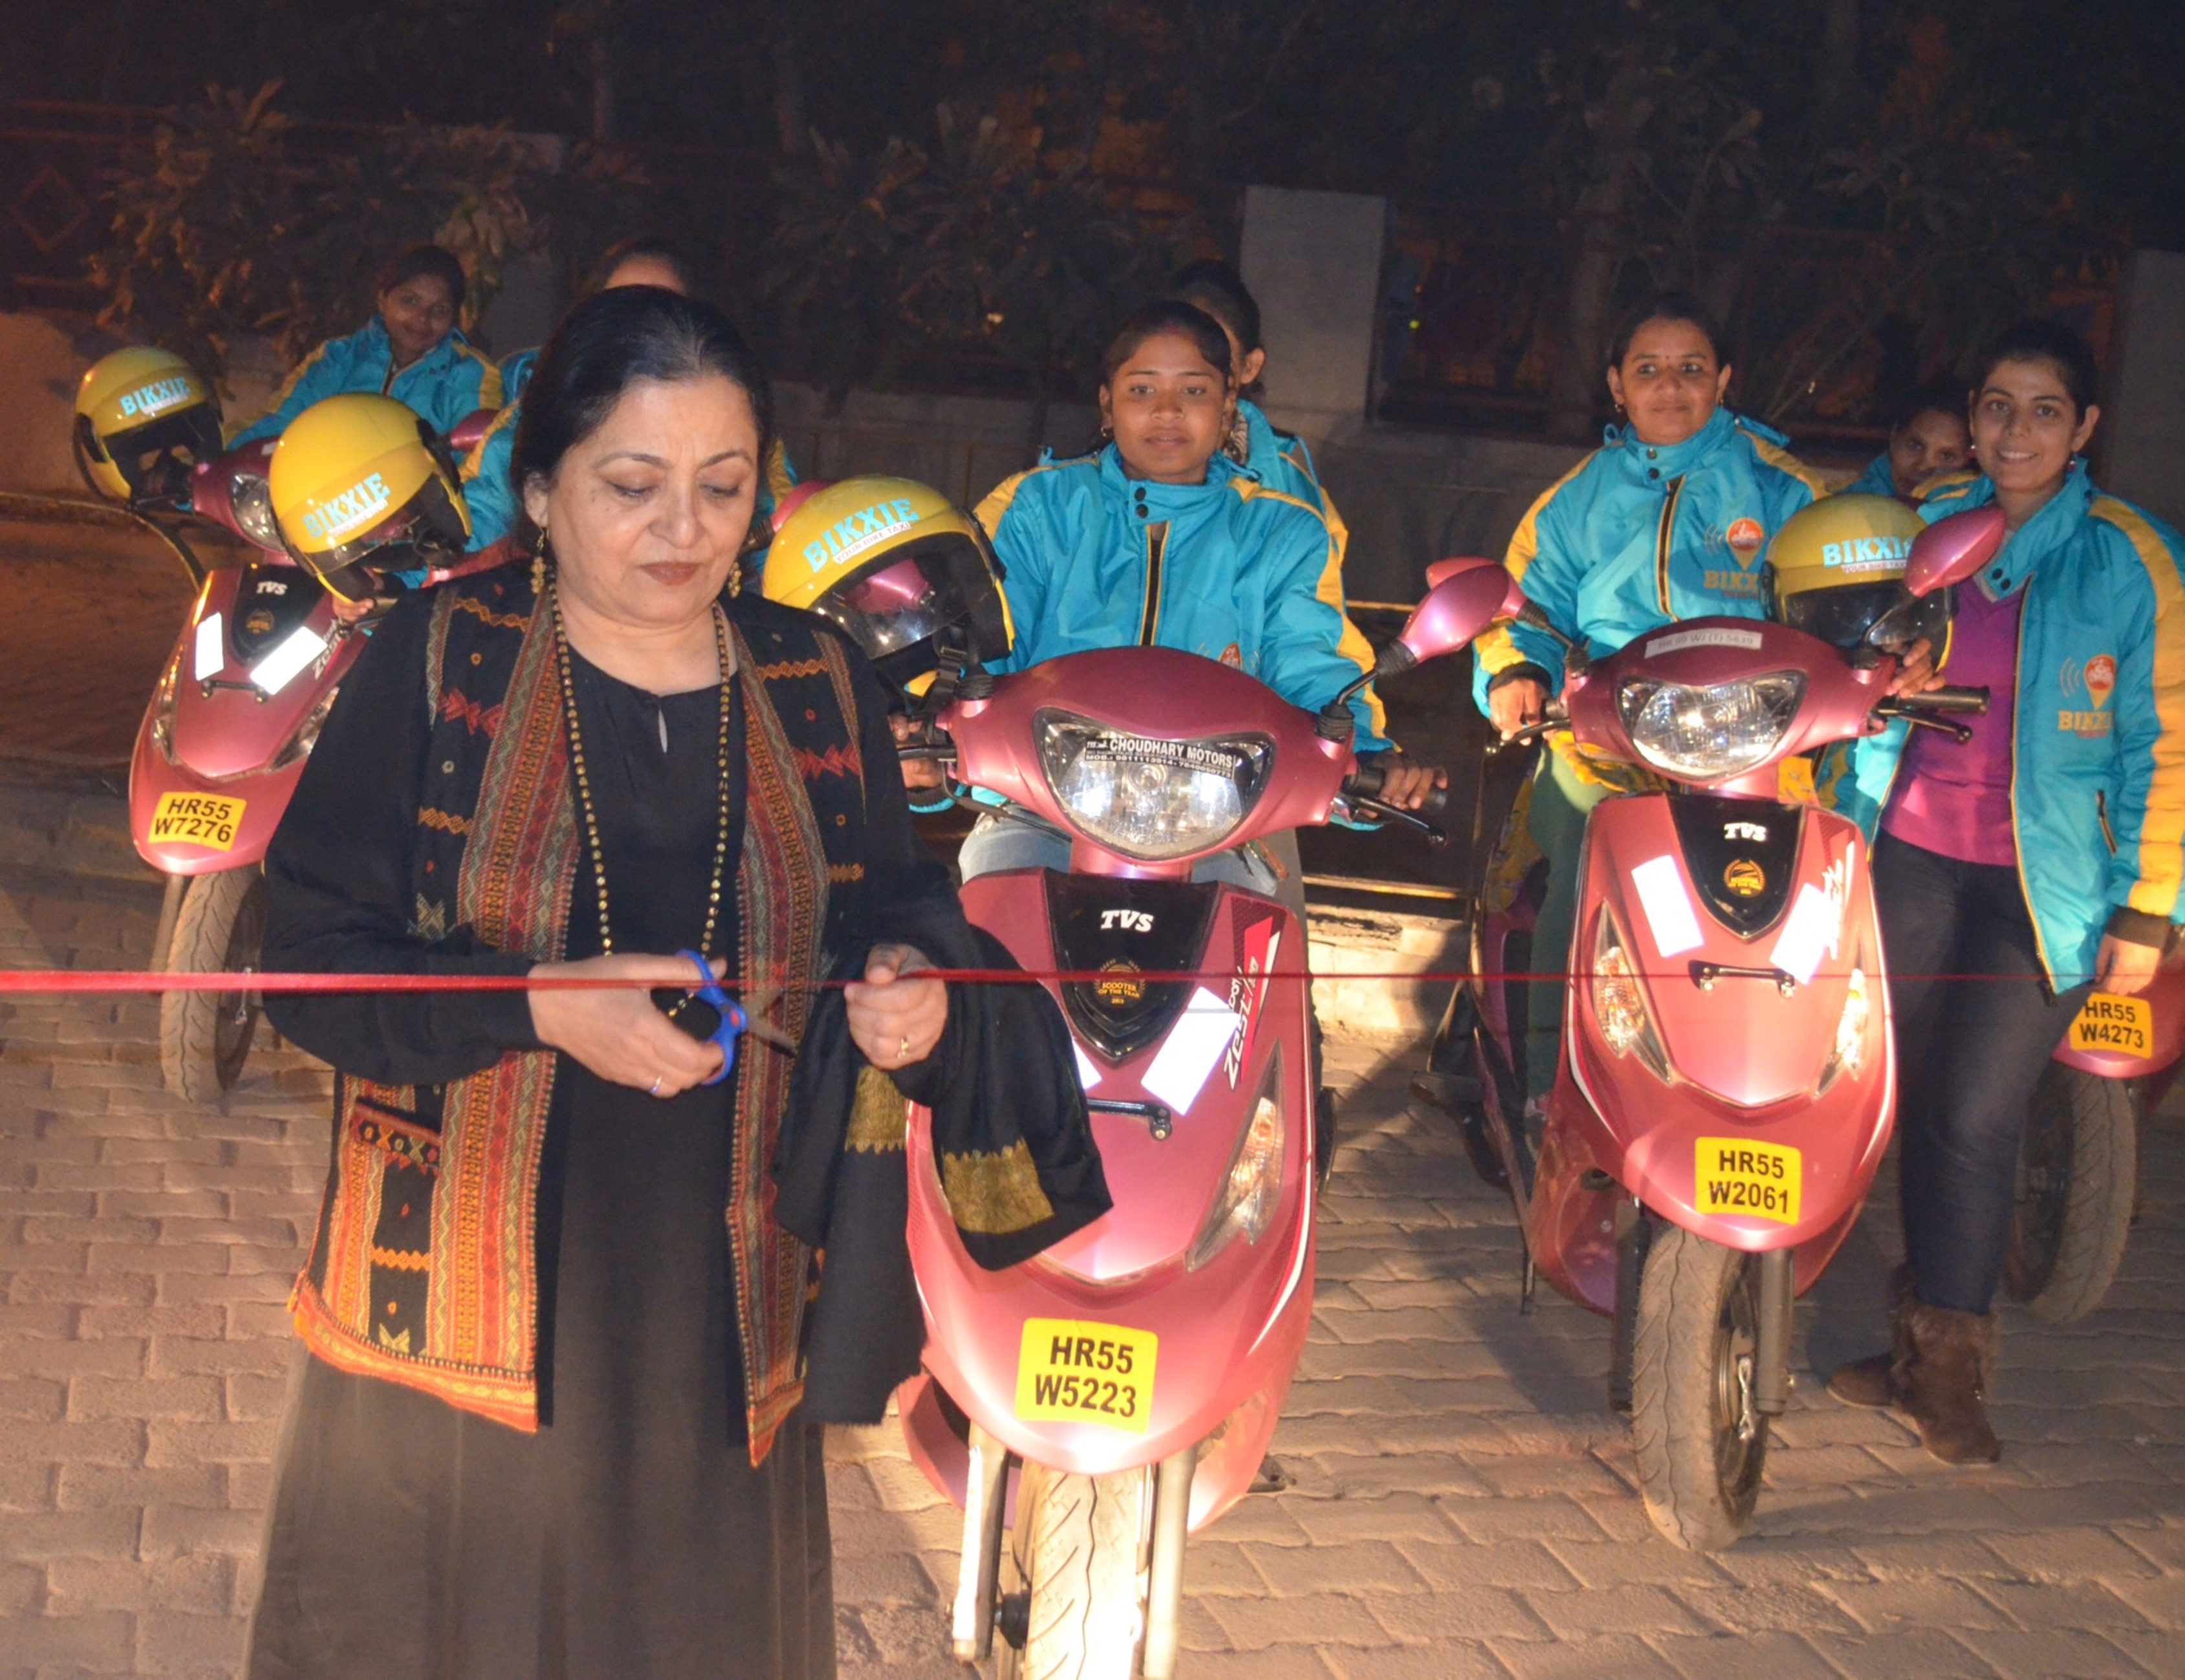 Madhu Kishwer innaugrating Bikxie Pink